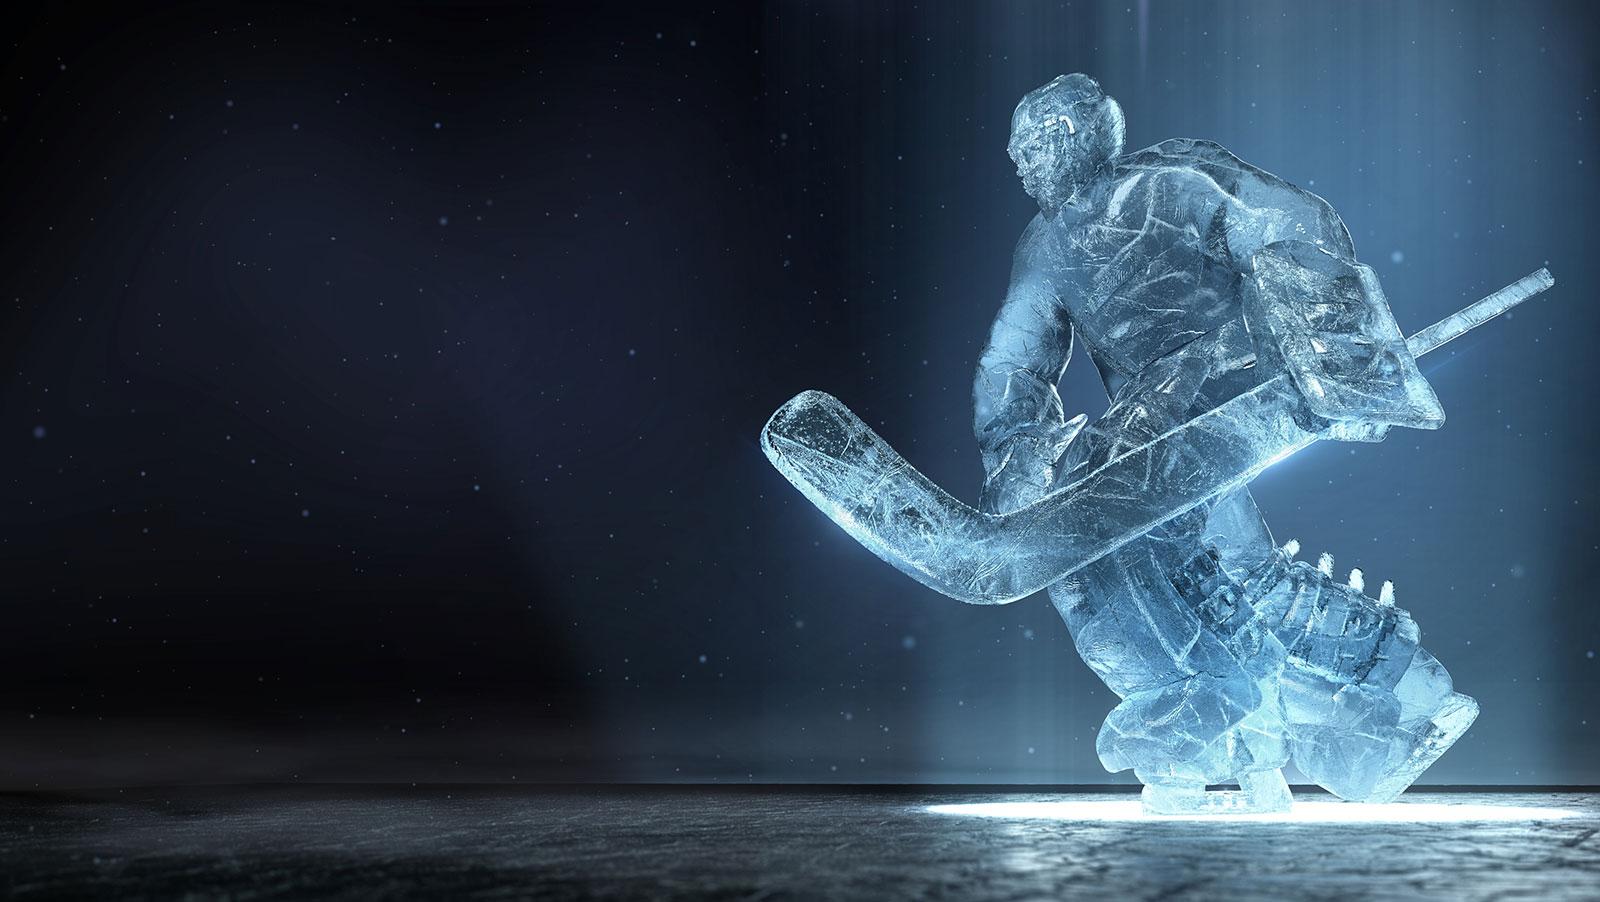 Stanley Cup odds update: Lightning clear favorites